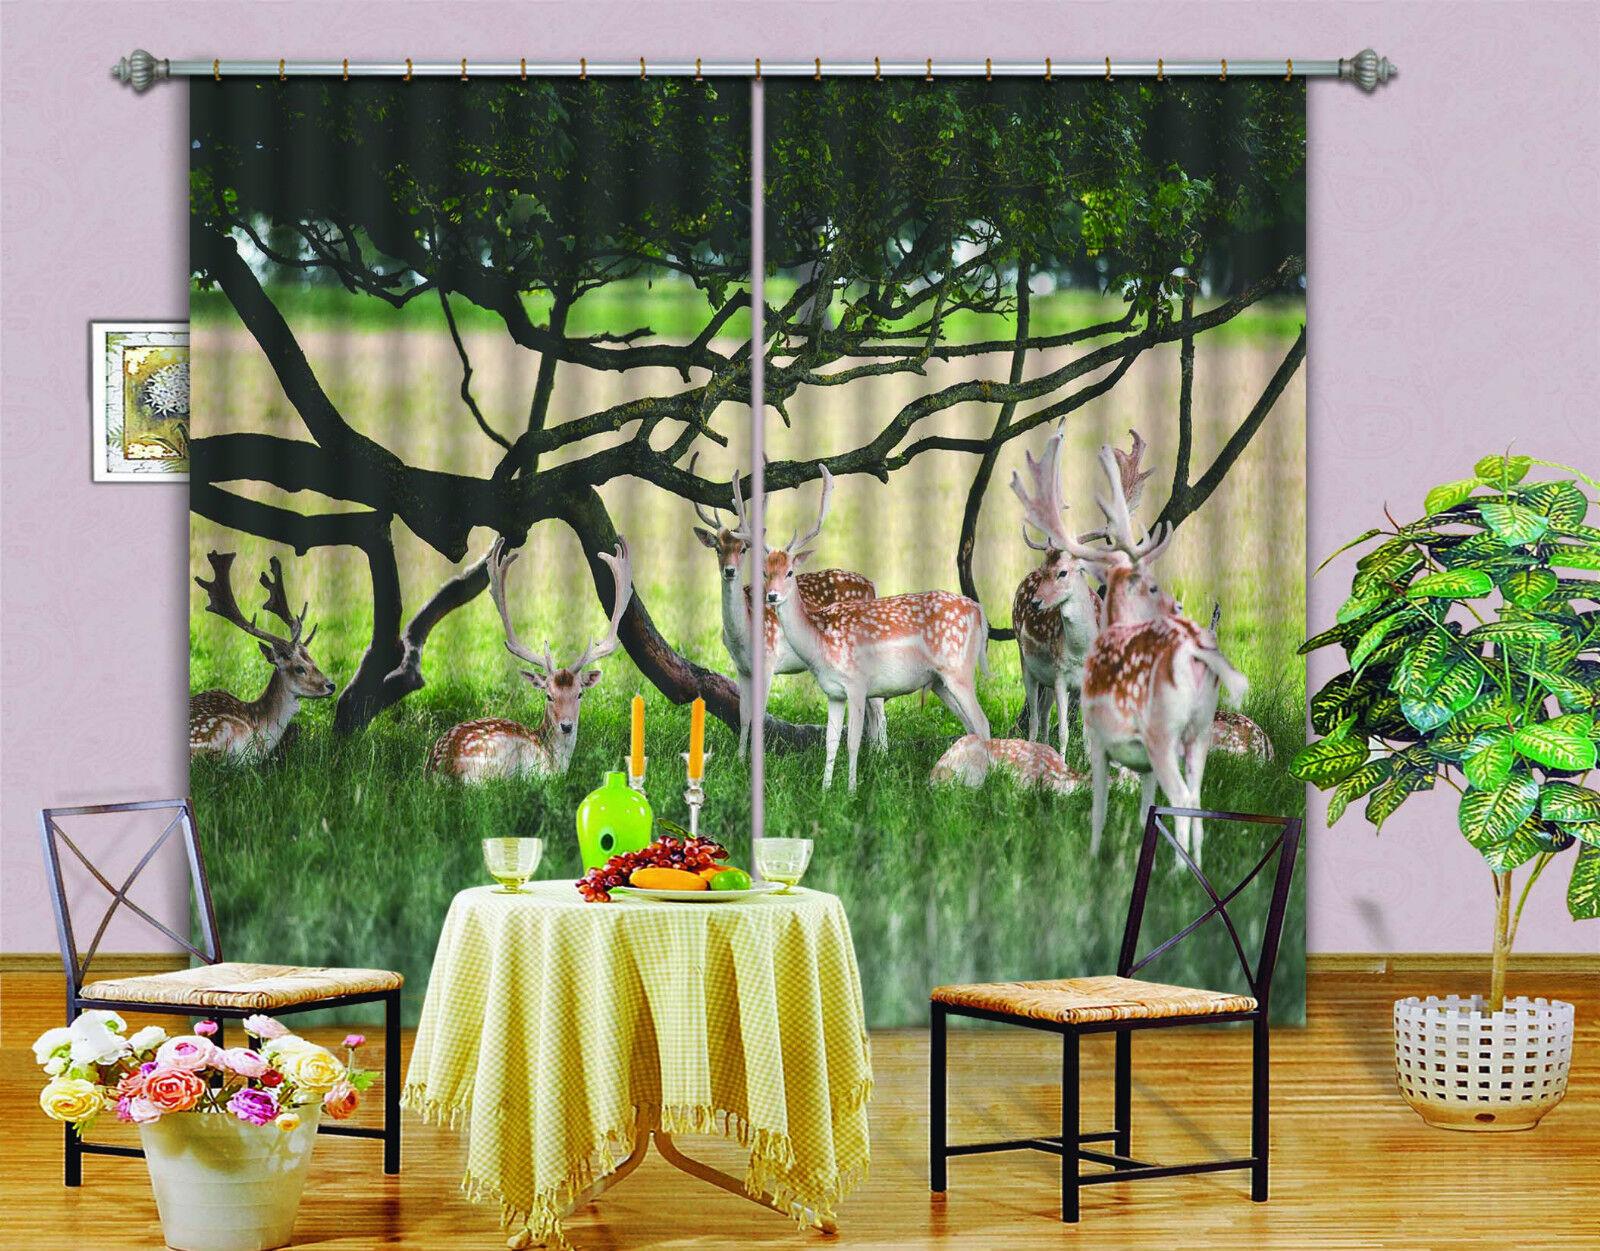 3d césped Hirsch 314 bloqueo foto cortina cortina de impresión sustancia cortinas de ventana